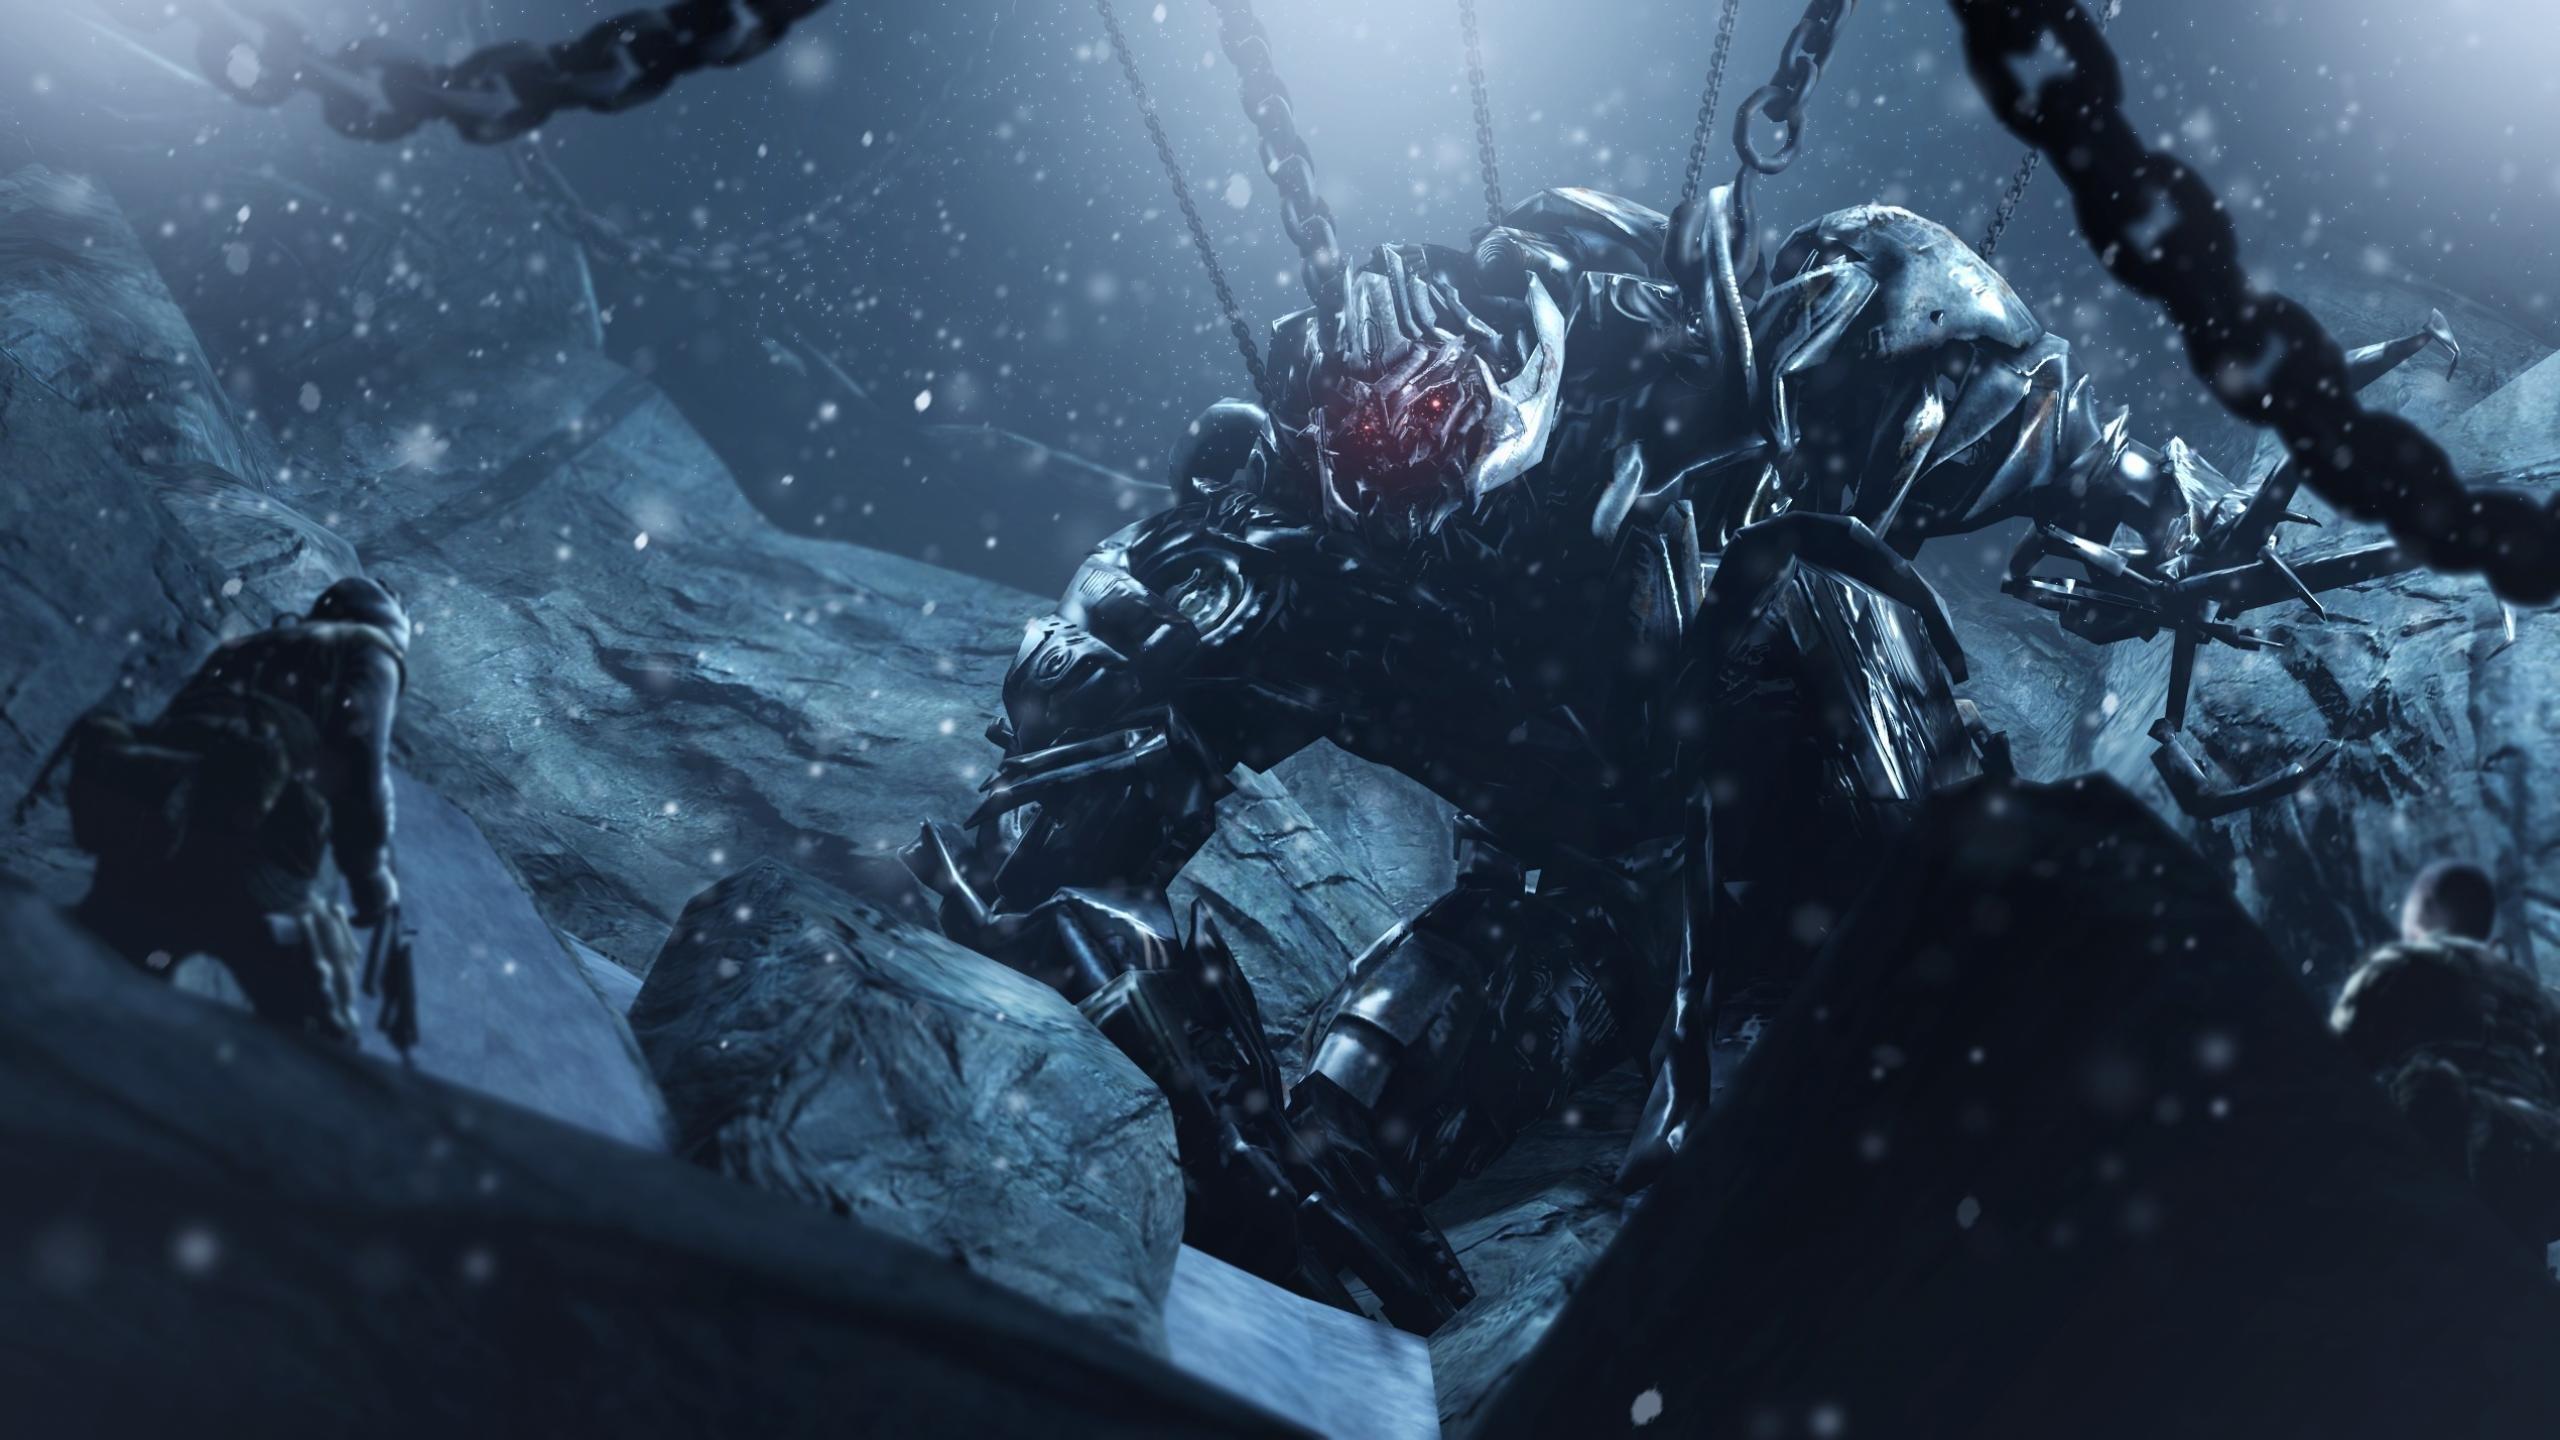 Transformers Fall Of Cybertron Wallpaper Hd Transformers Fall Of Cybertron Wallpapers Hd For Desktop